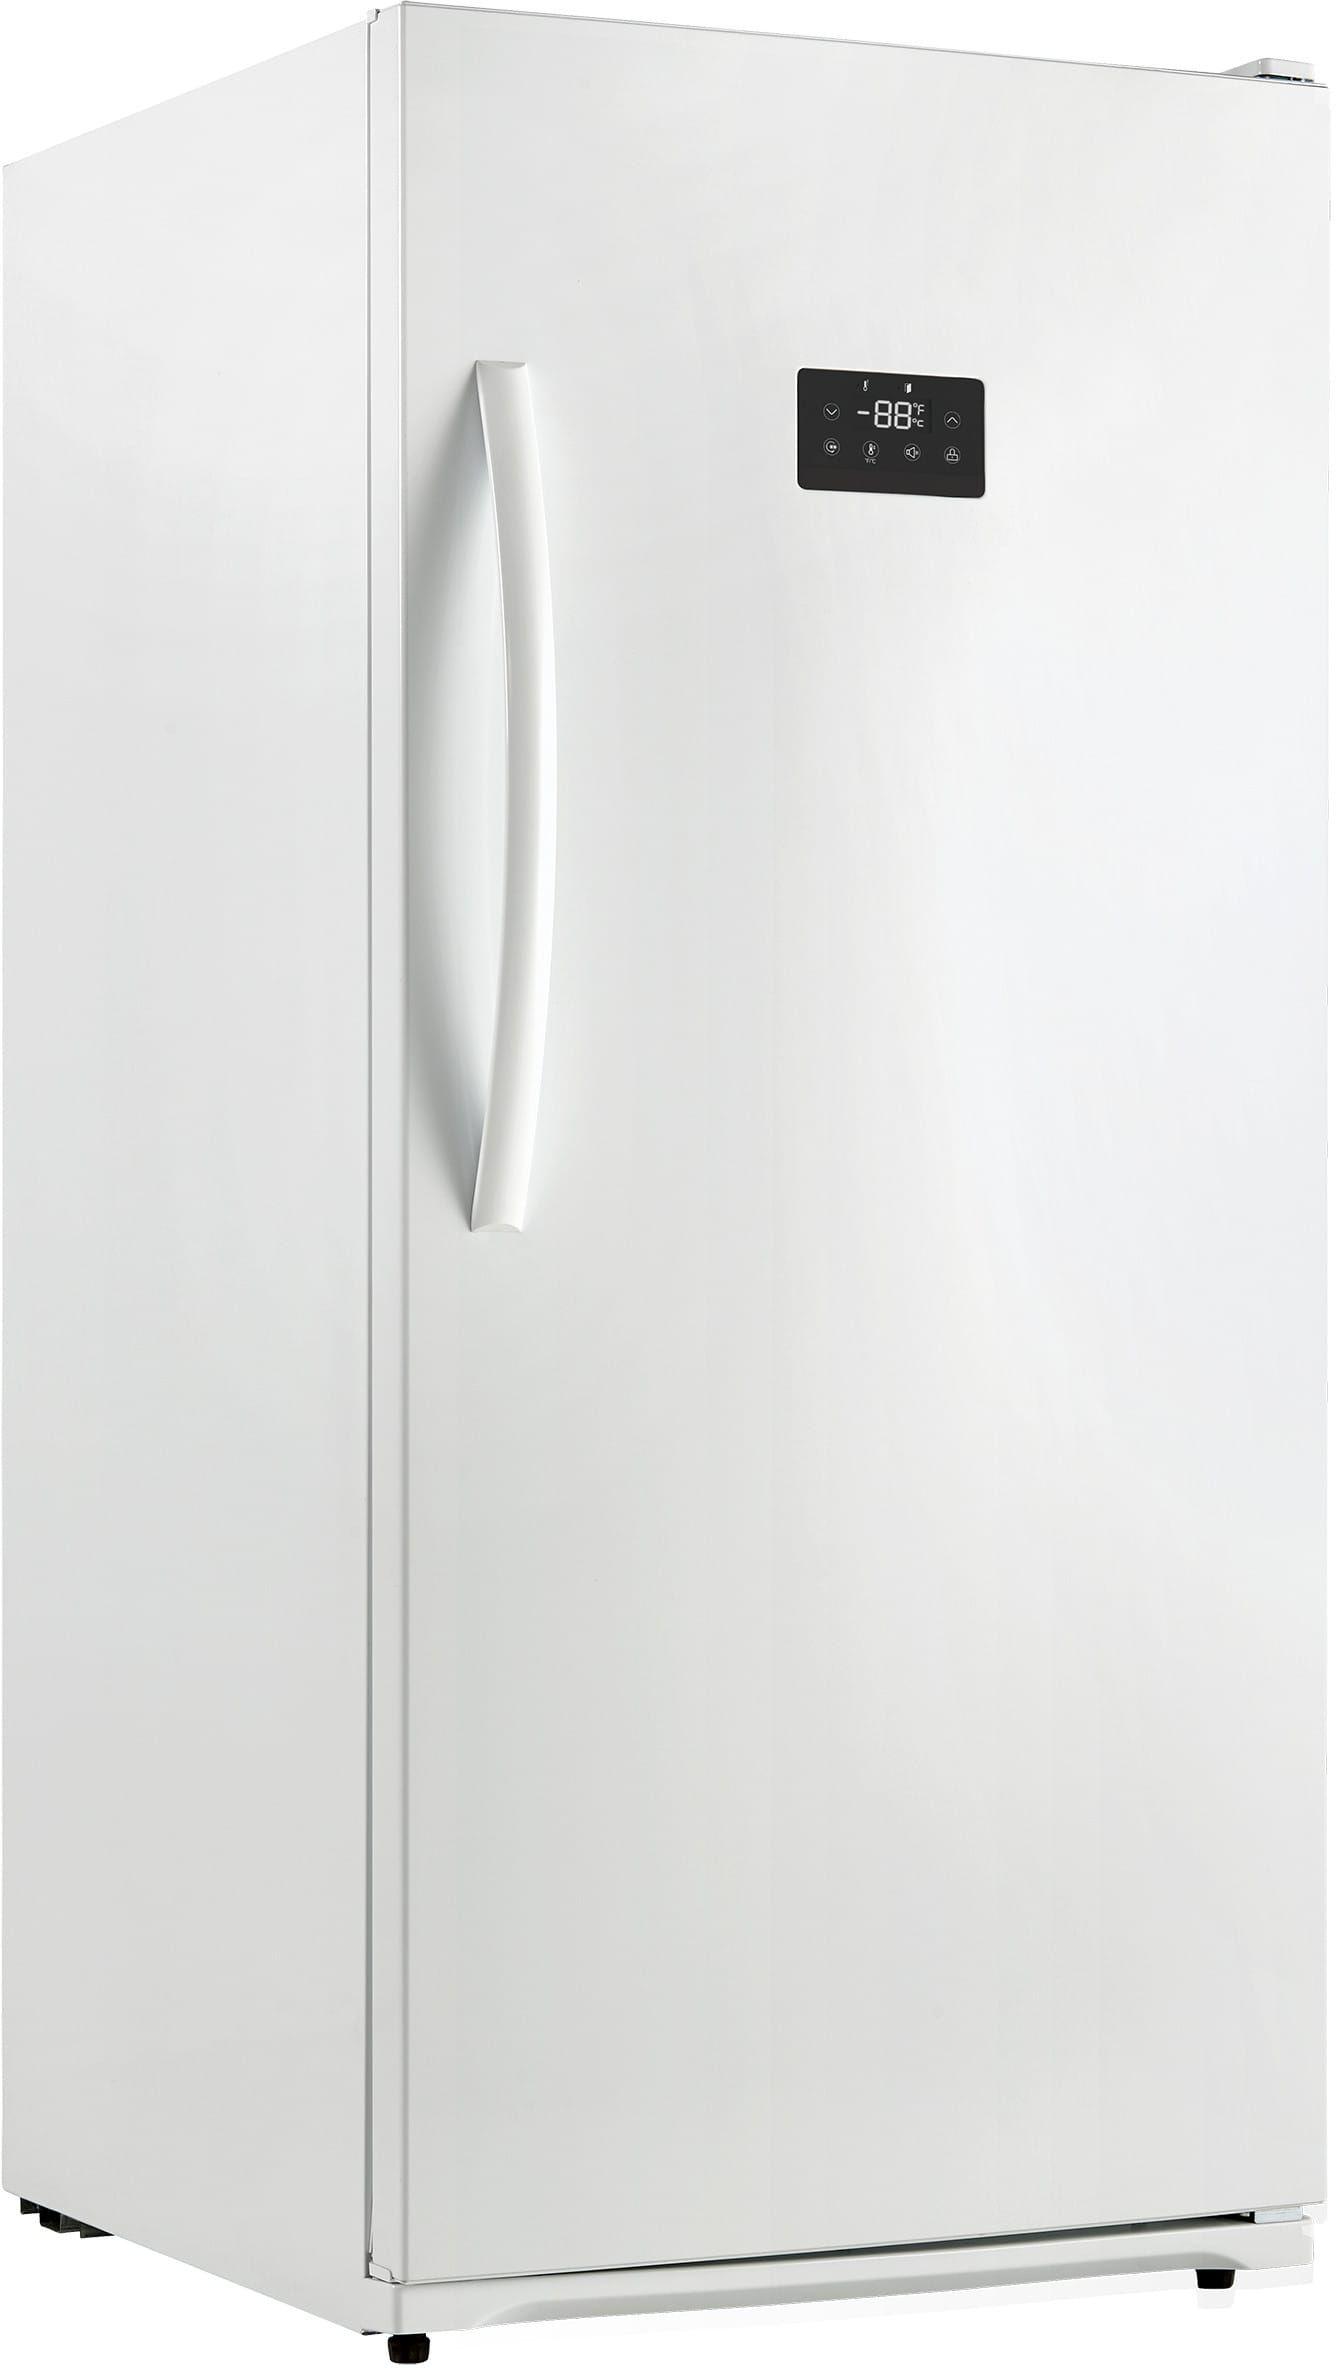 Danby duf138e1wdd 28 inch upright freezer with 138 cu ft